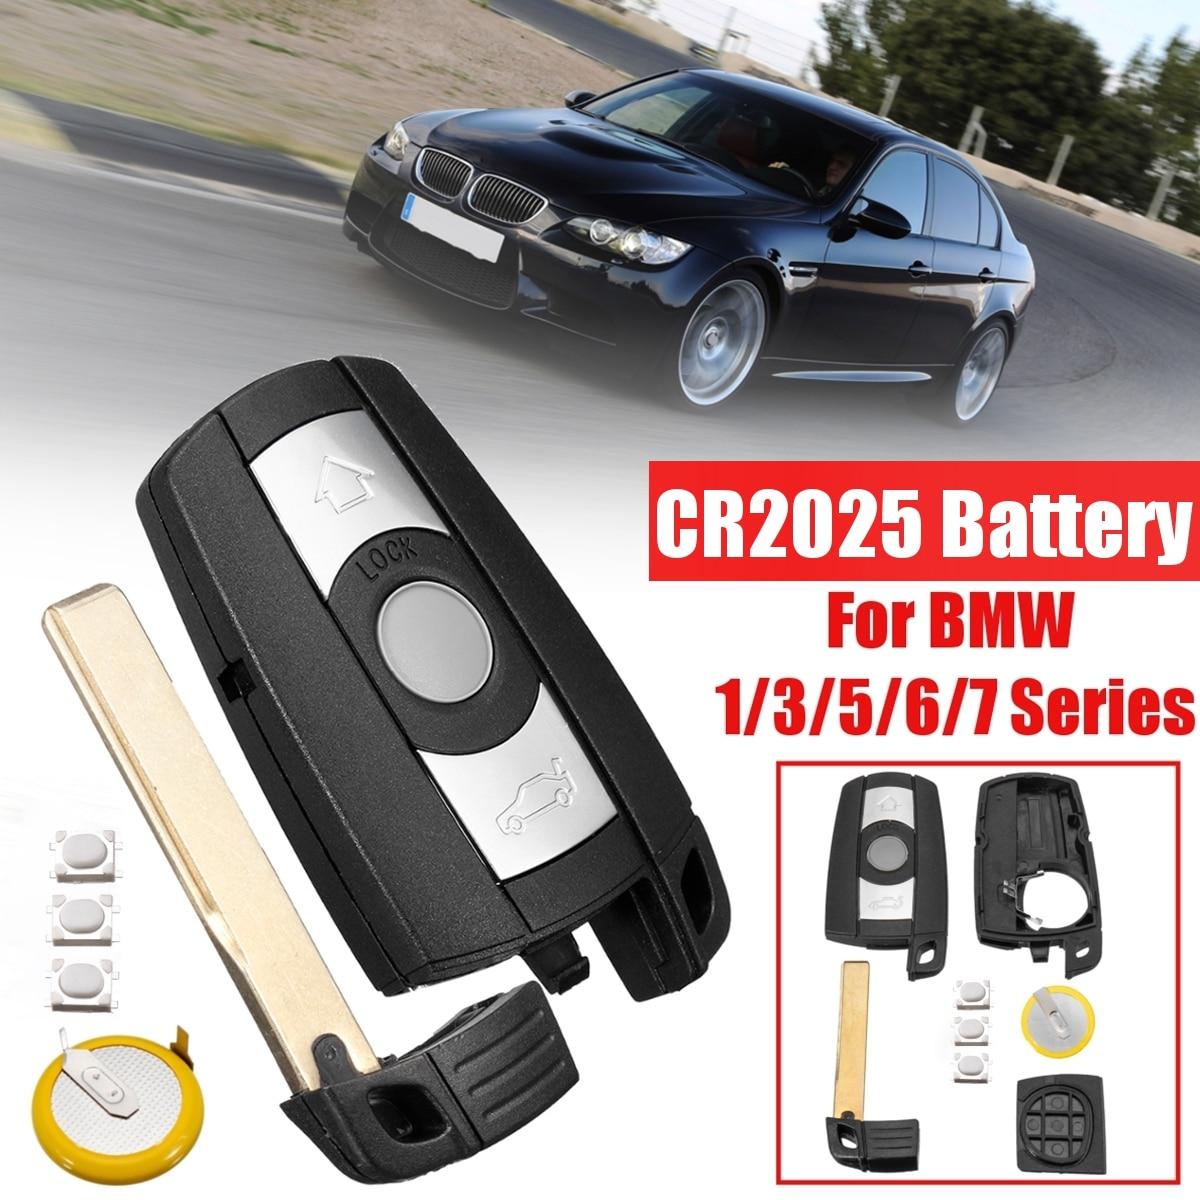 With Blade Battery 3 Button Remote Car Key Shell Case Styling Cover Trim For BMW 1 3 5 6 7 Series E90 E92 E93 E60 E61 X1 X5 X6(China)